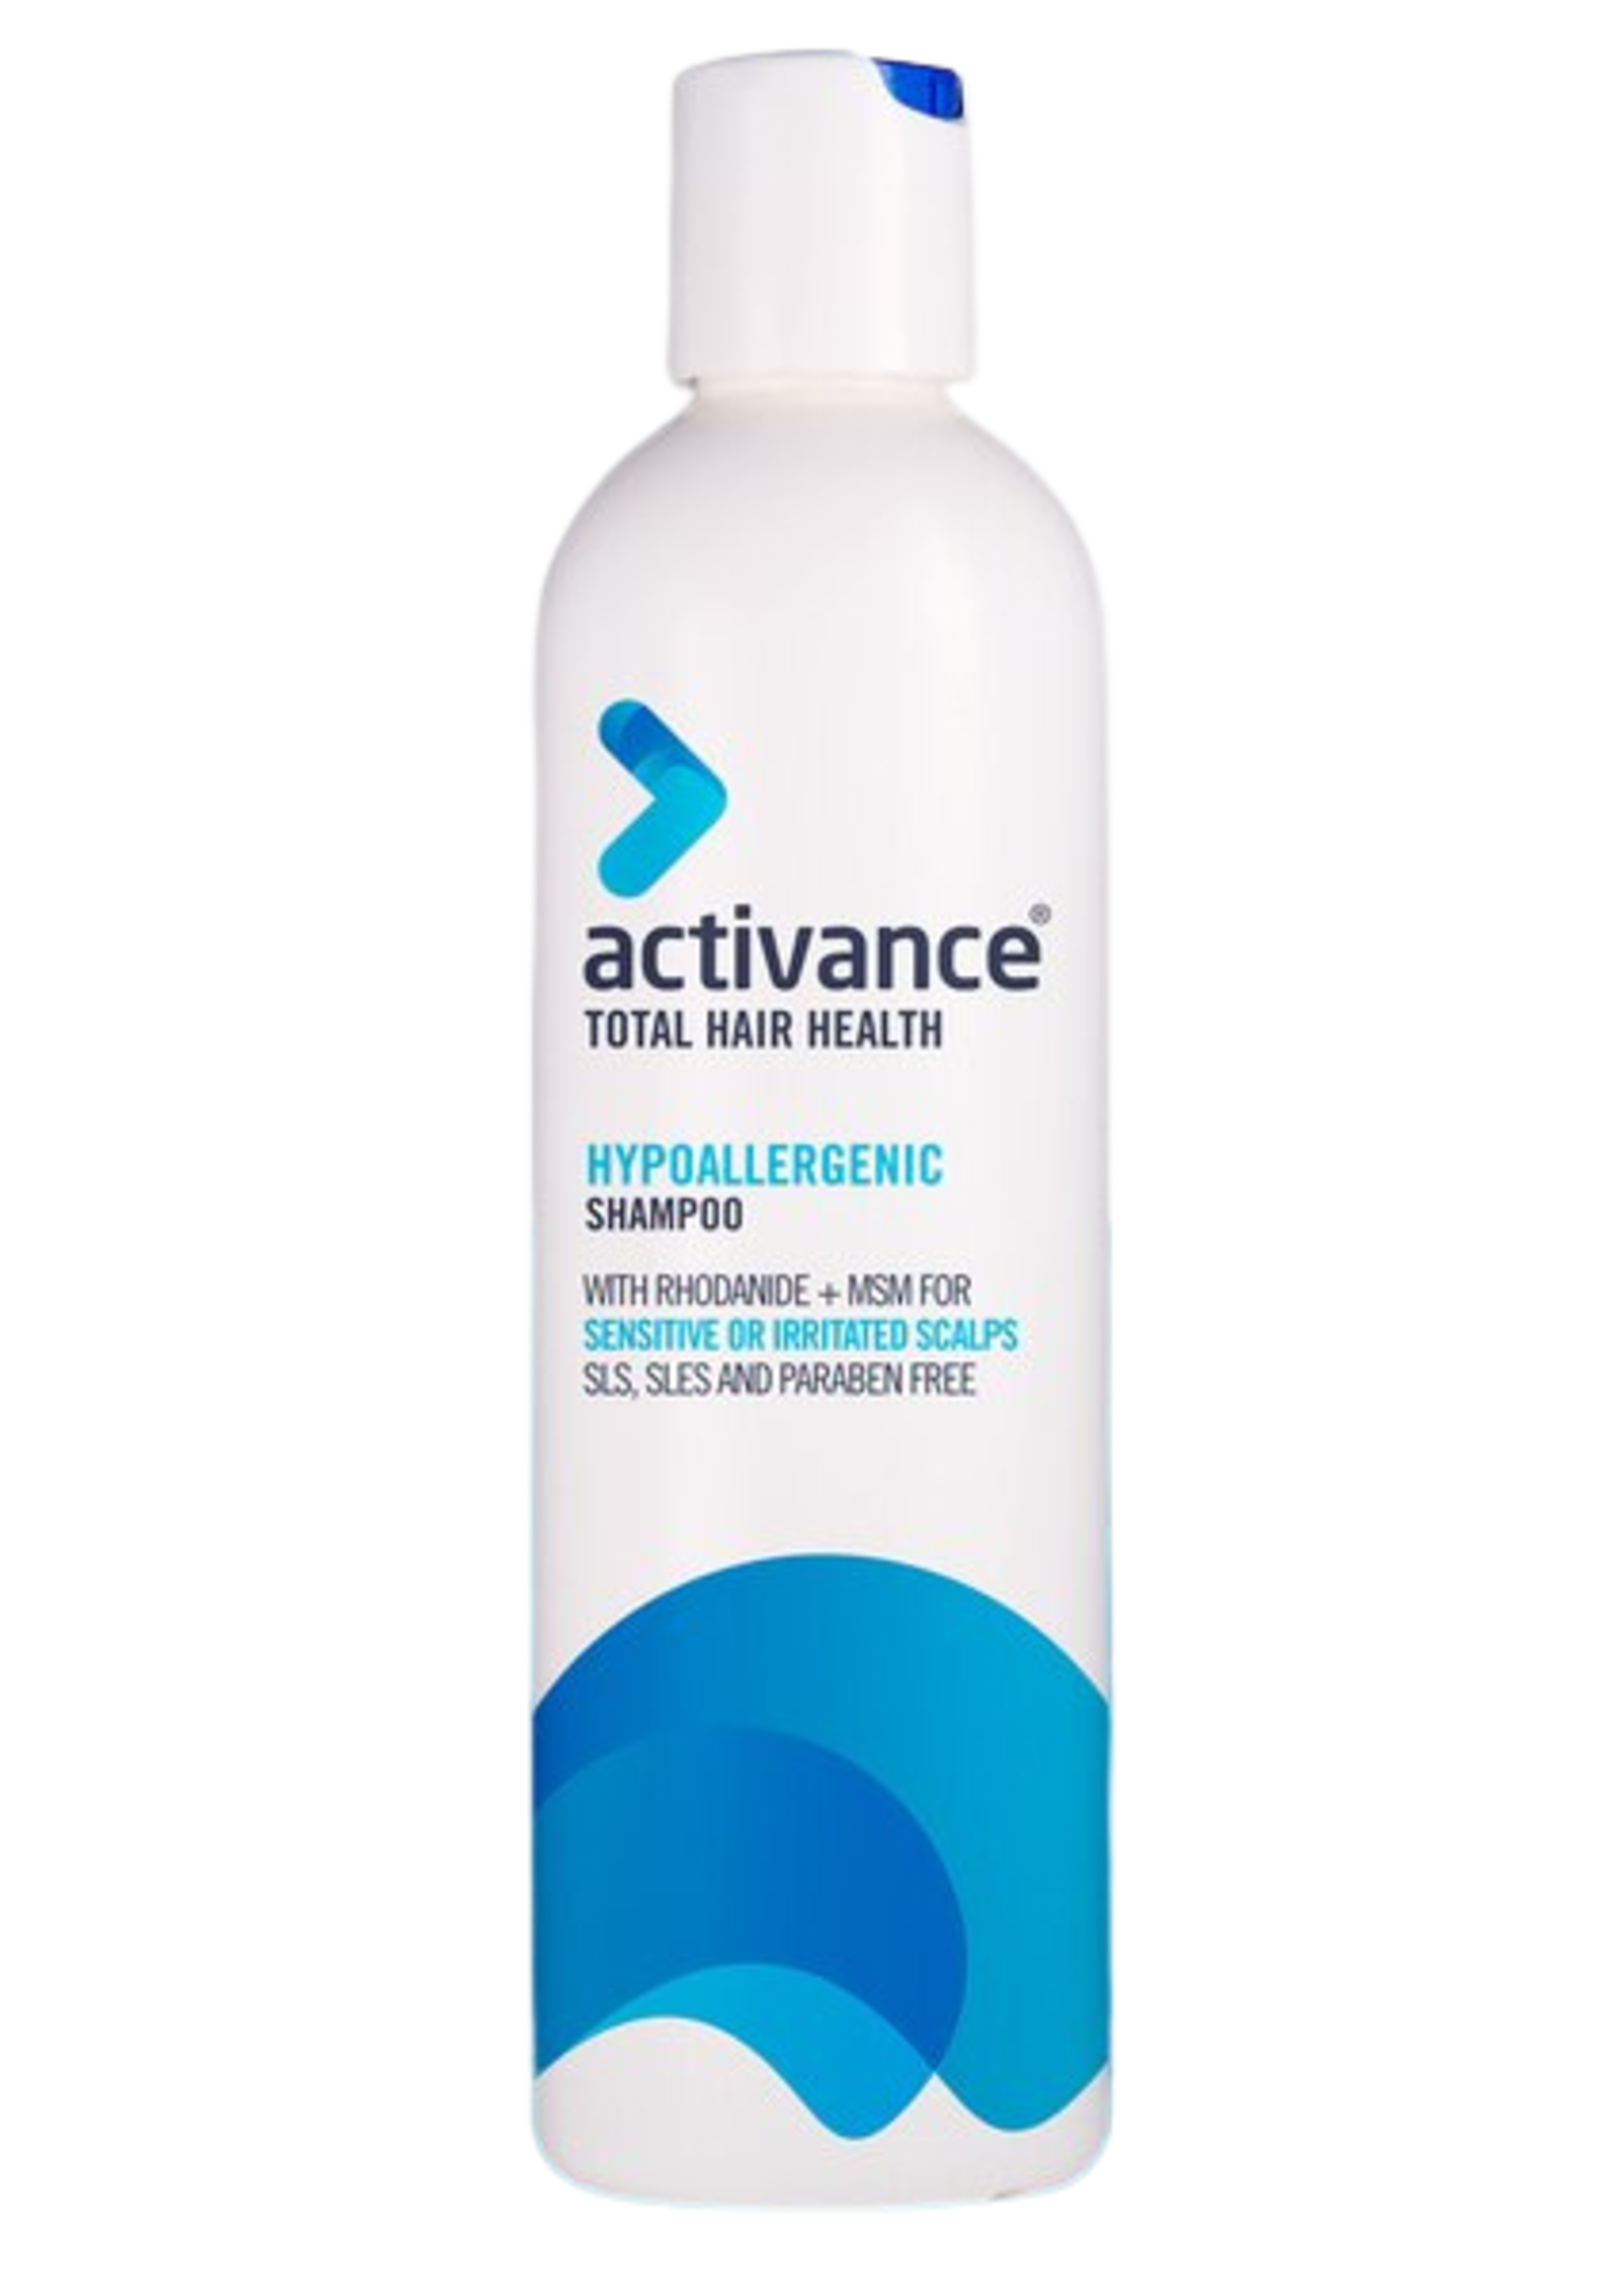 Activance Professional Activance Hypoallergenic Shampoo 250ml